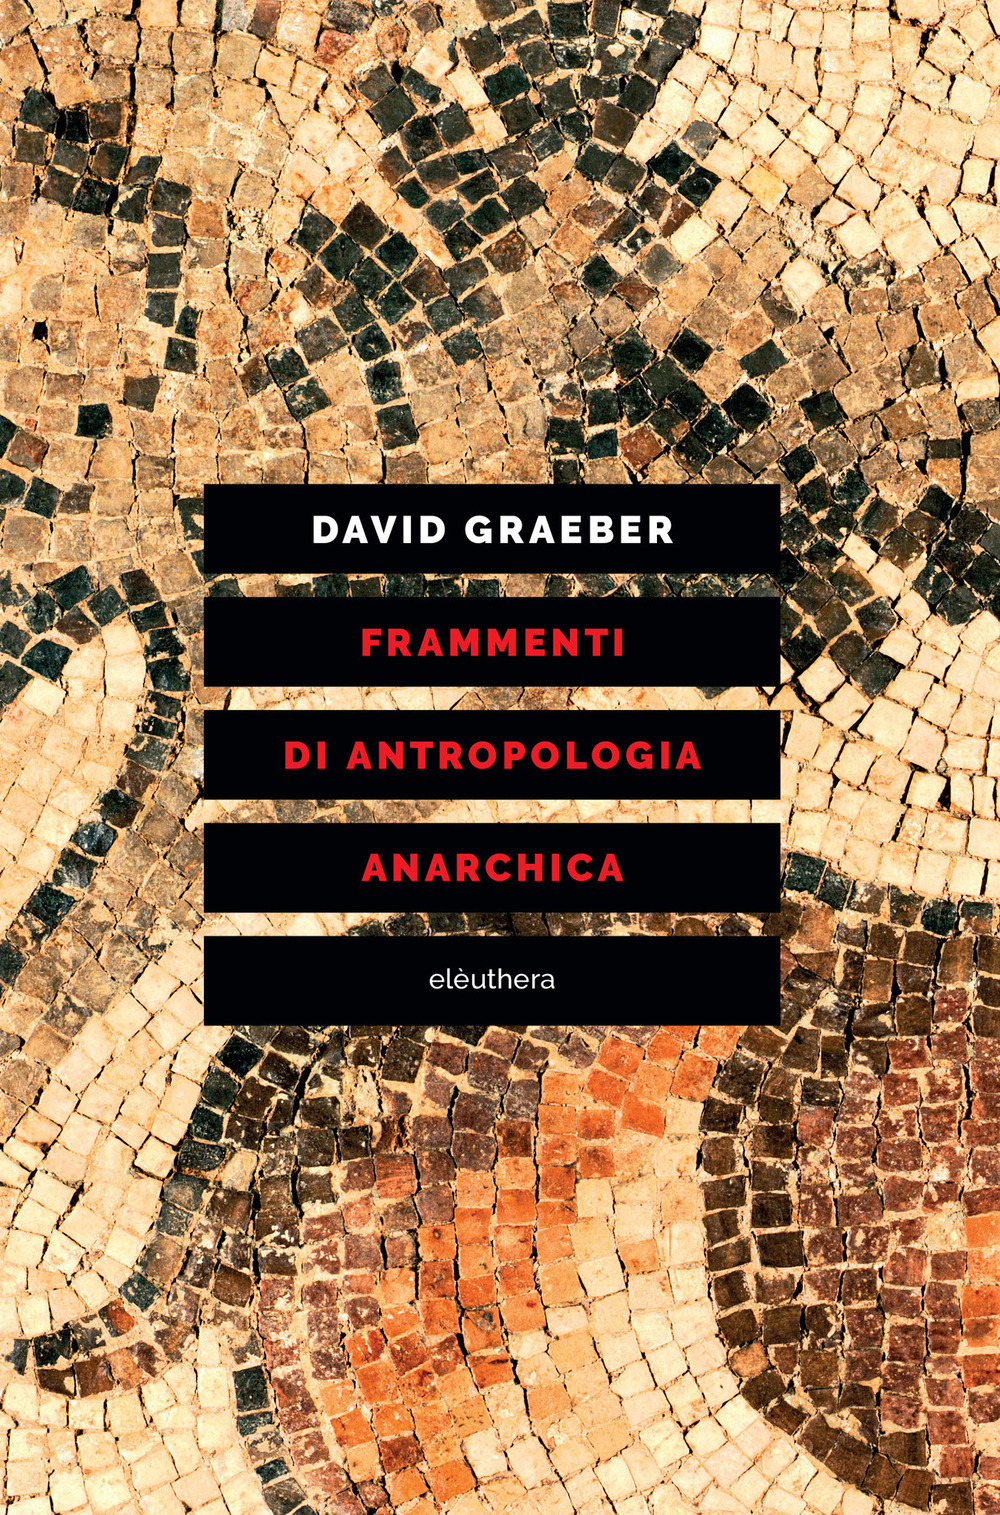 FRAMMENTI DI ANTROPOLOGIA ANARCHICA - Graeber David - 9788833020839